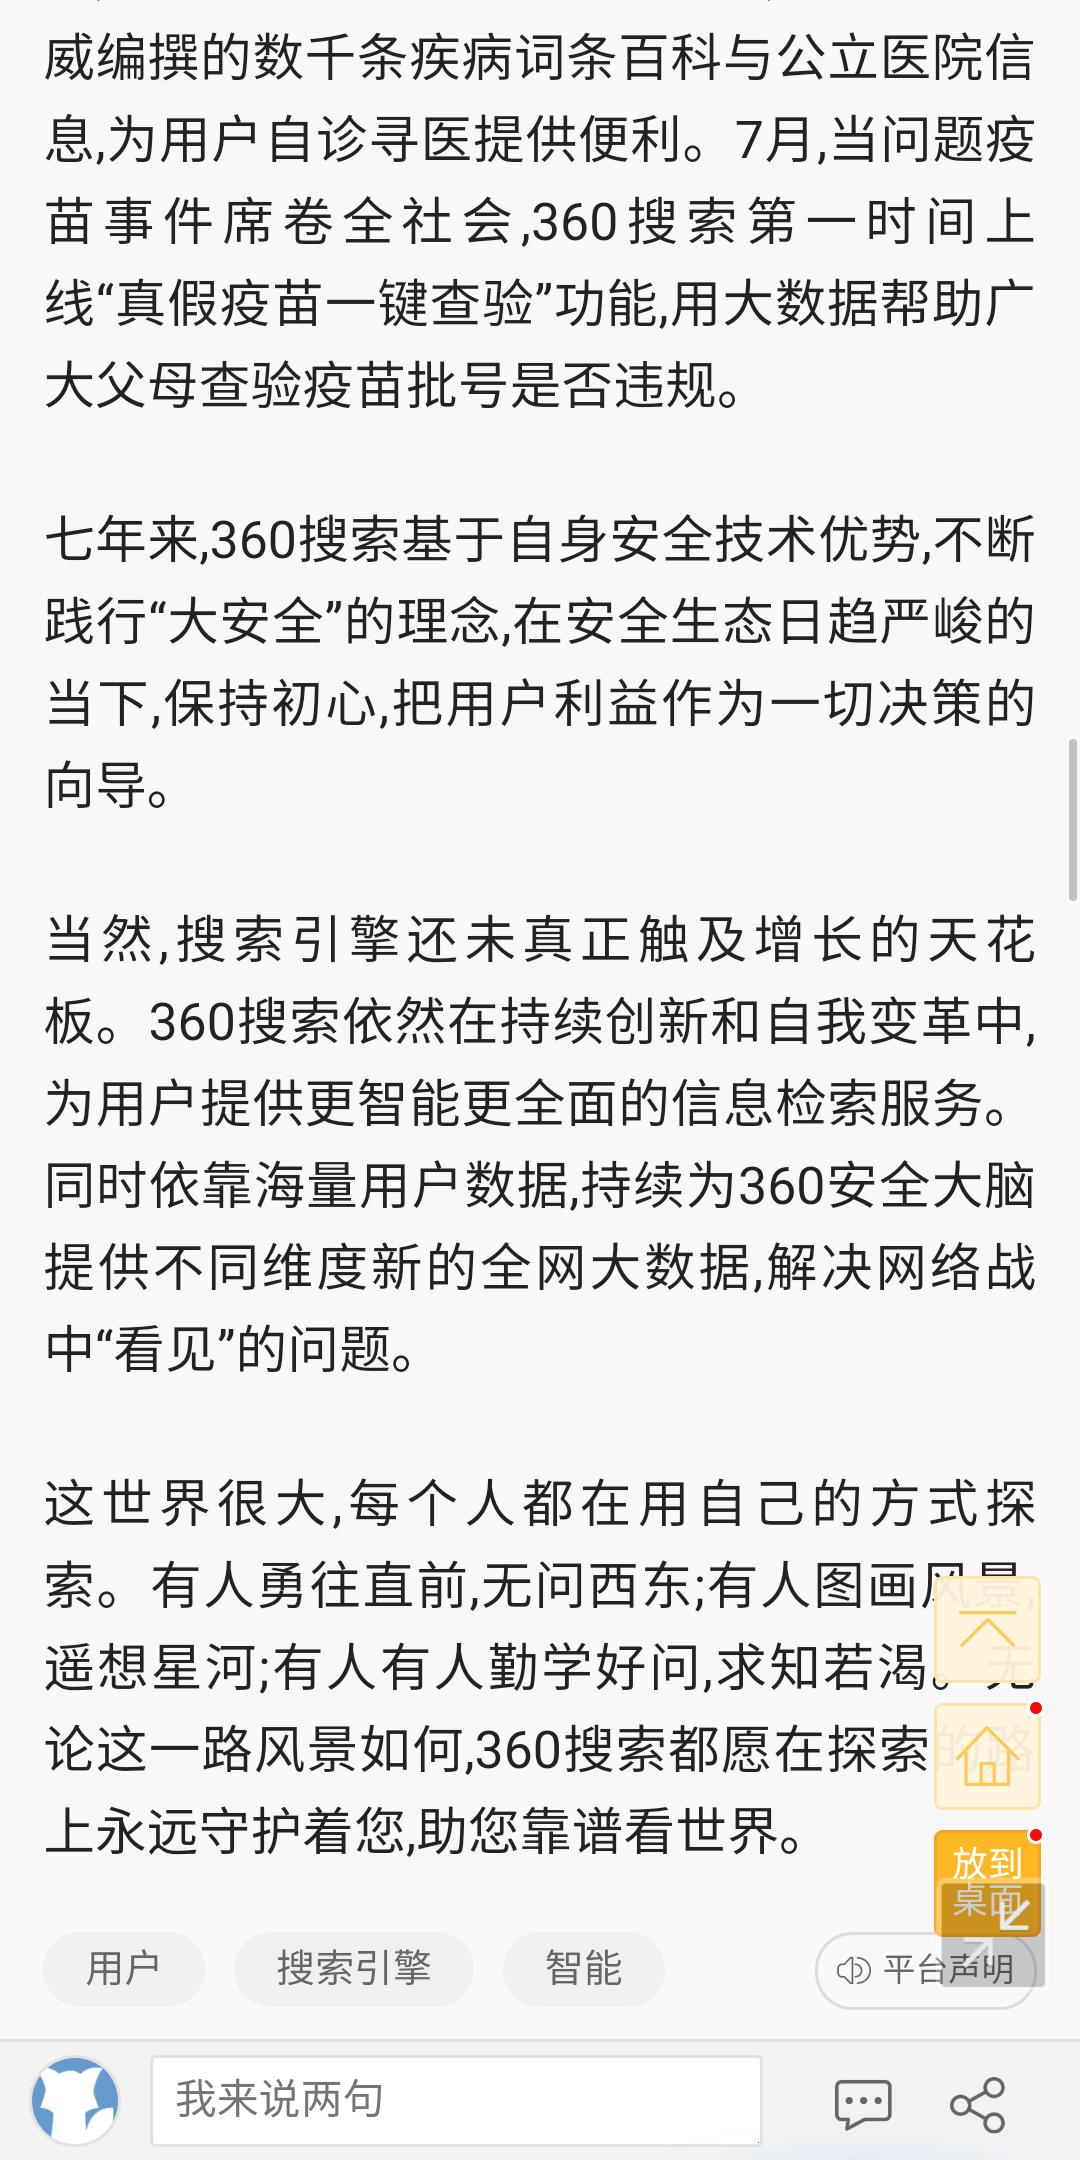 Screenshot_2019-09-03-16-24-34.png